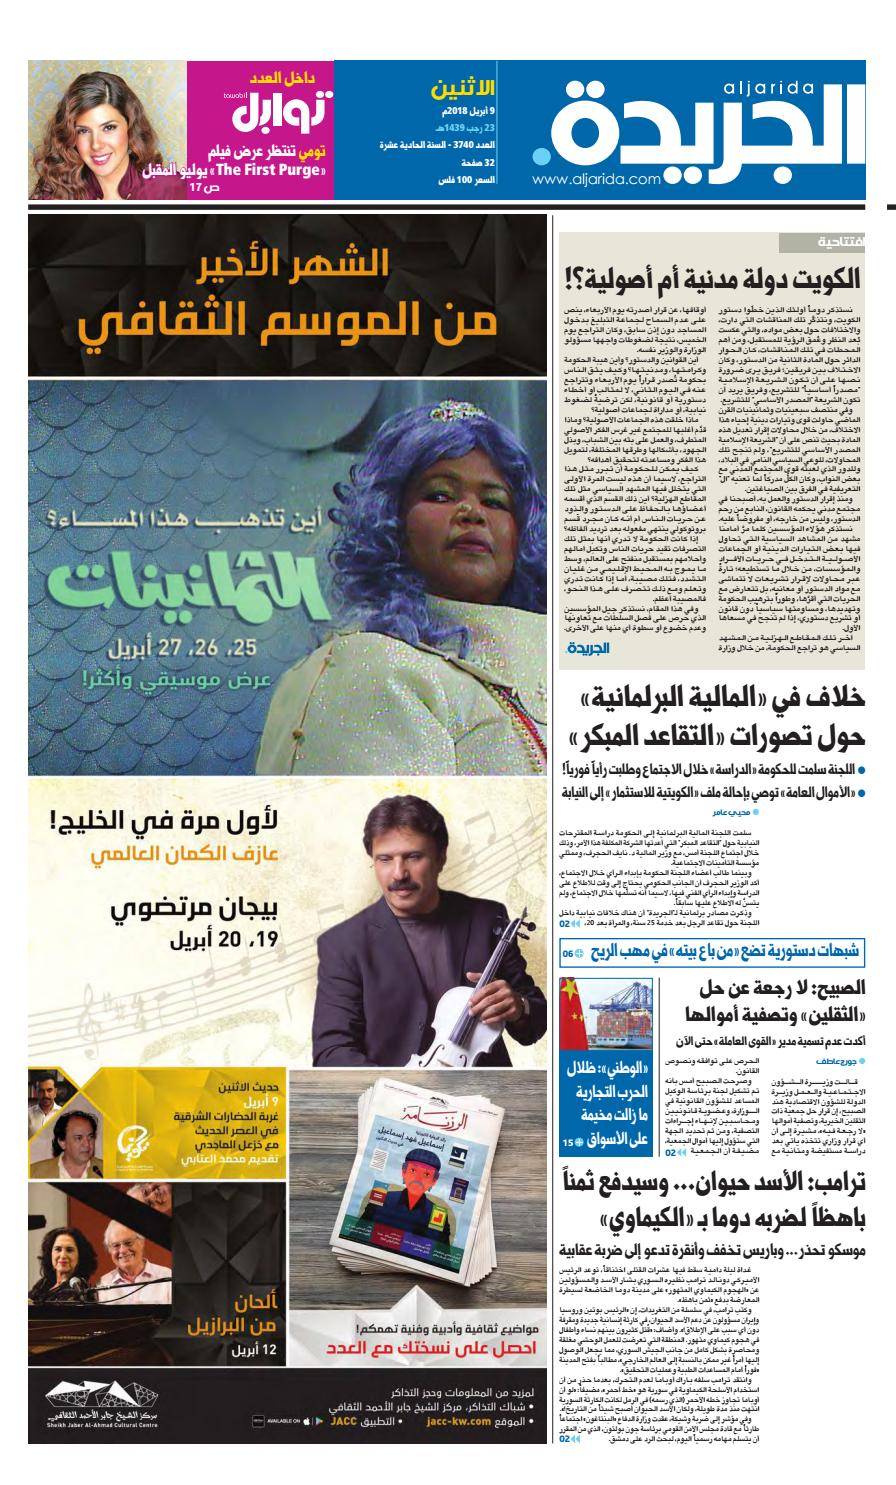 442eb95b8 عدد الجريدة الاثنين 09 أبريل 2018 by Aljarida Newspaper - issuu